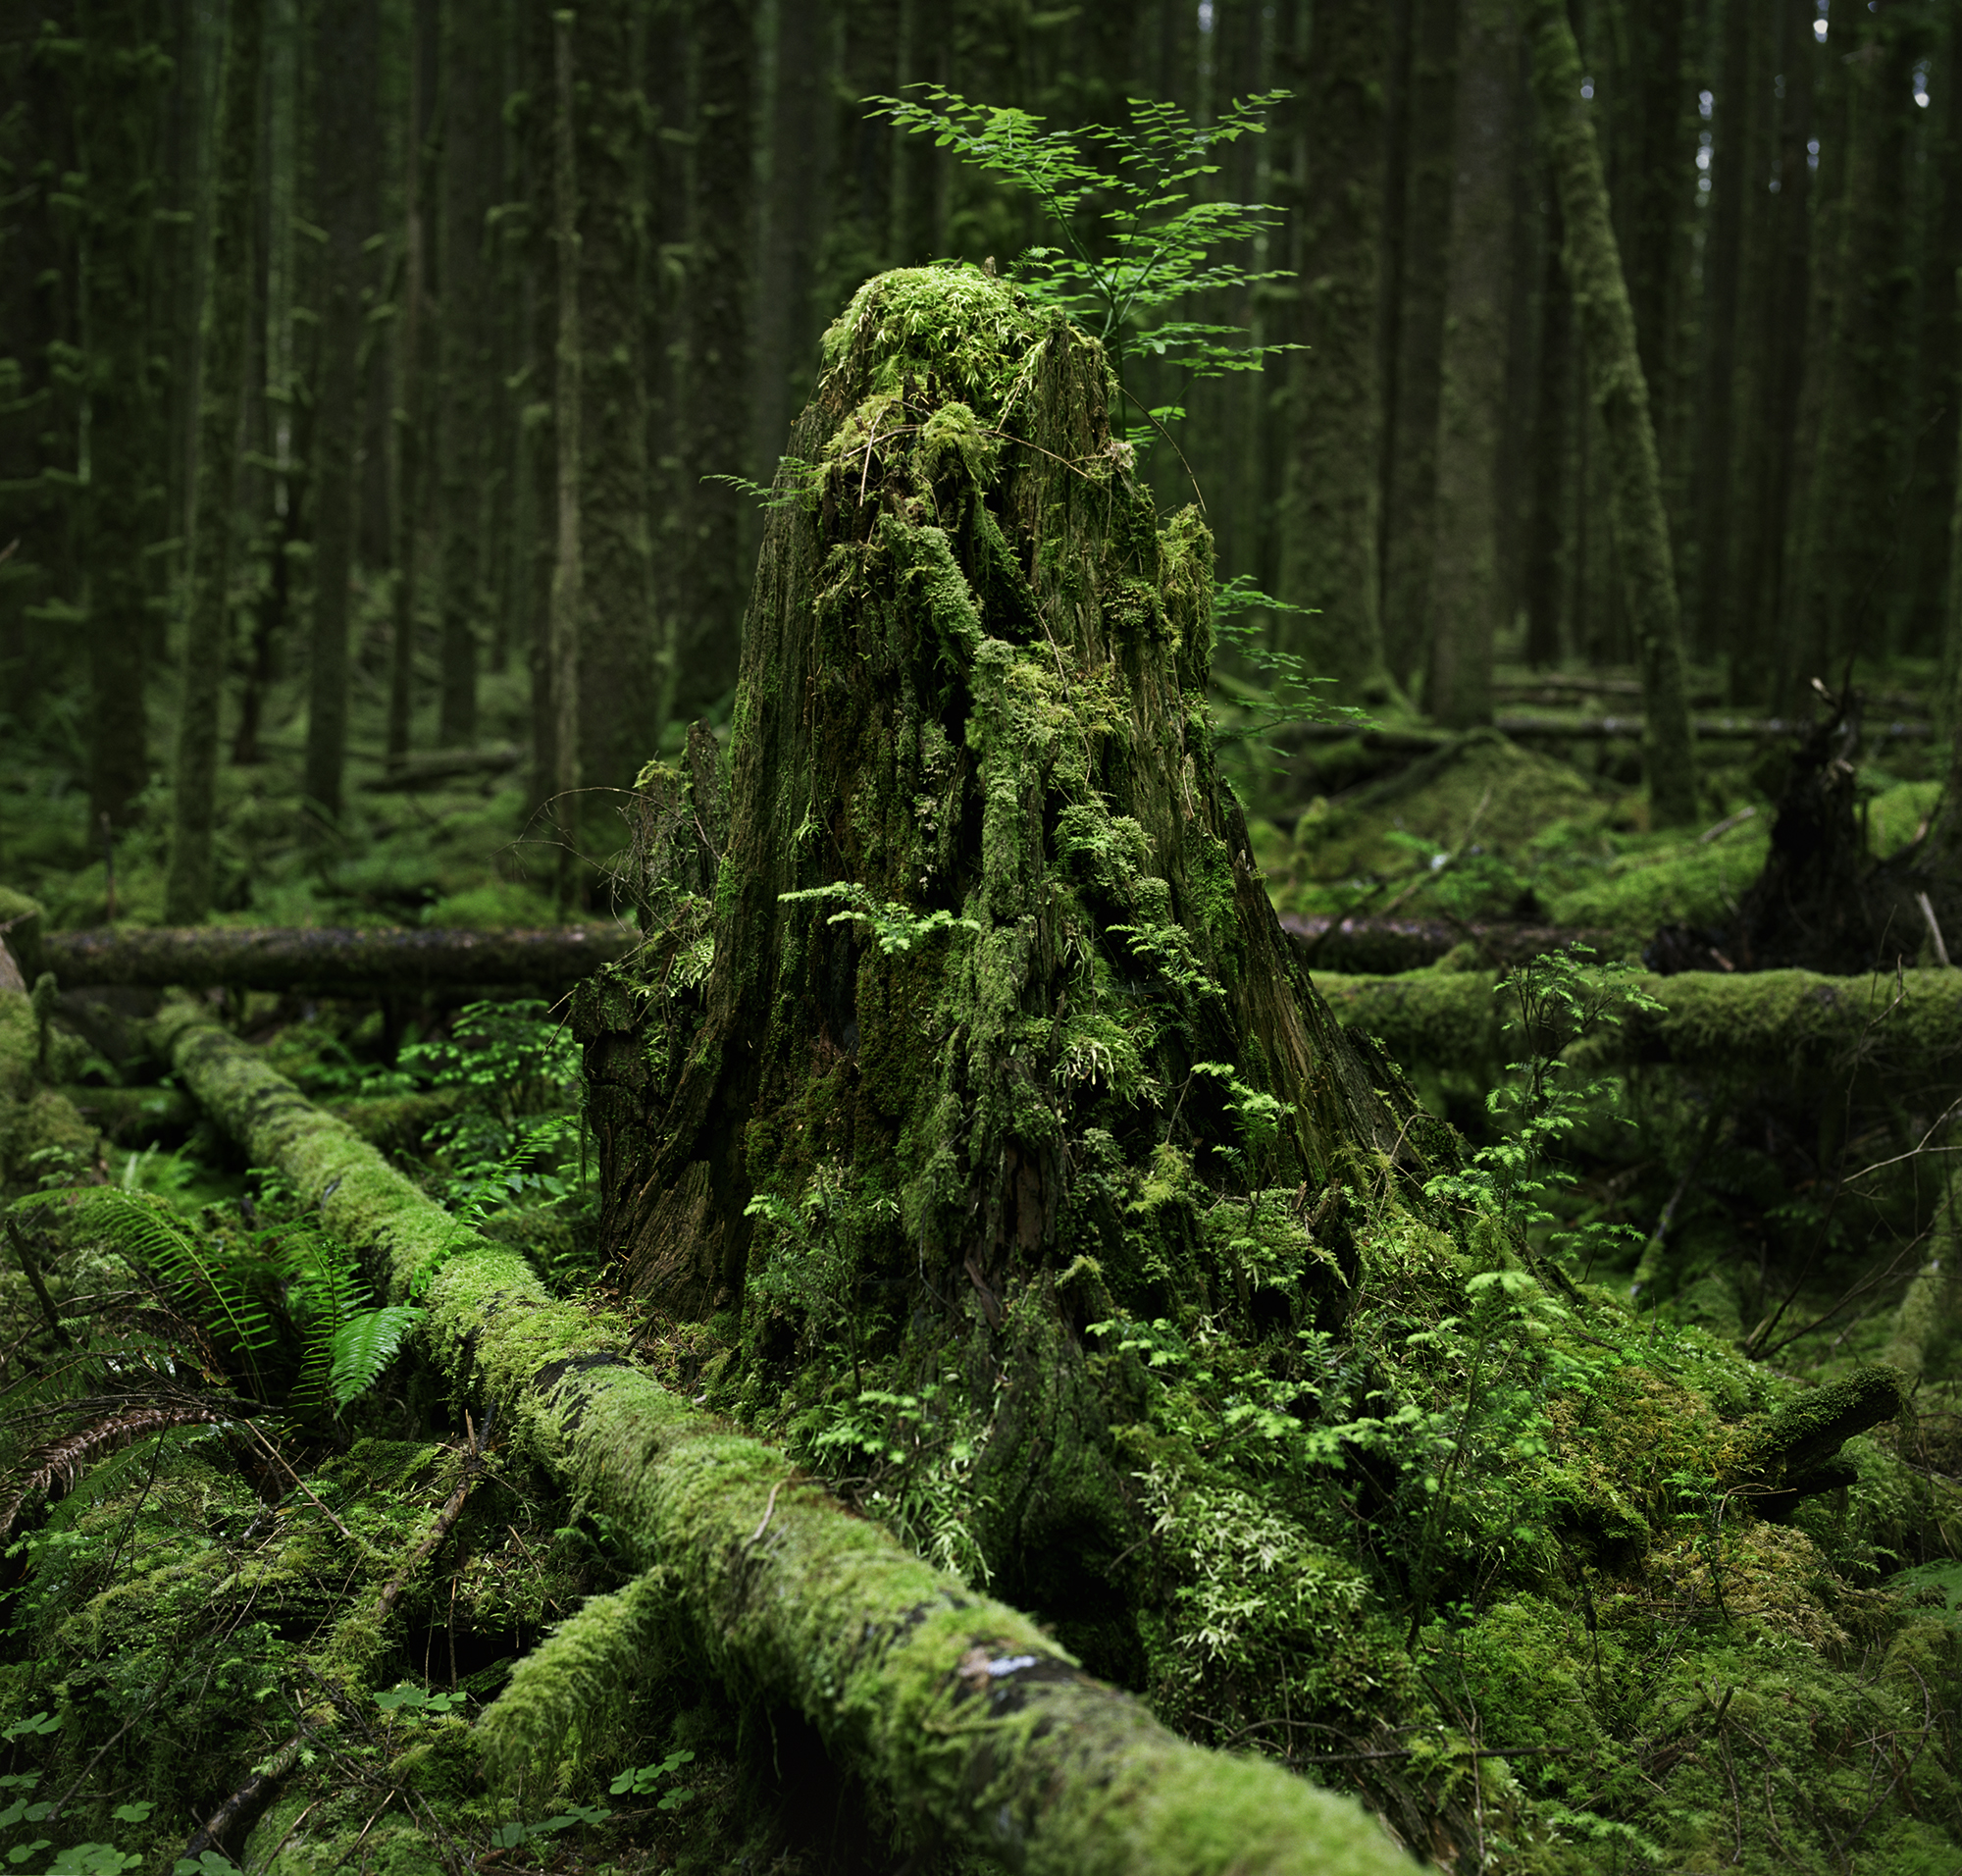 hoh stump 20 v2.jpg